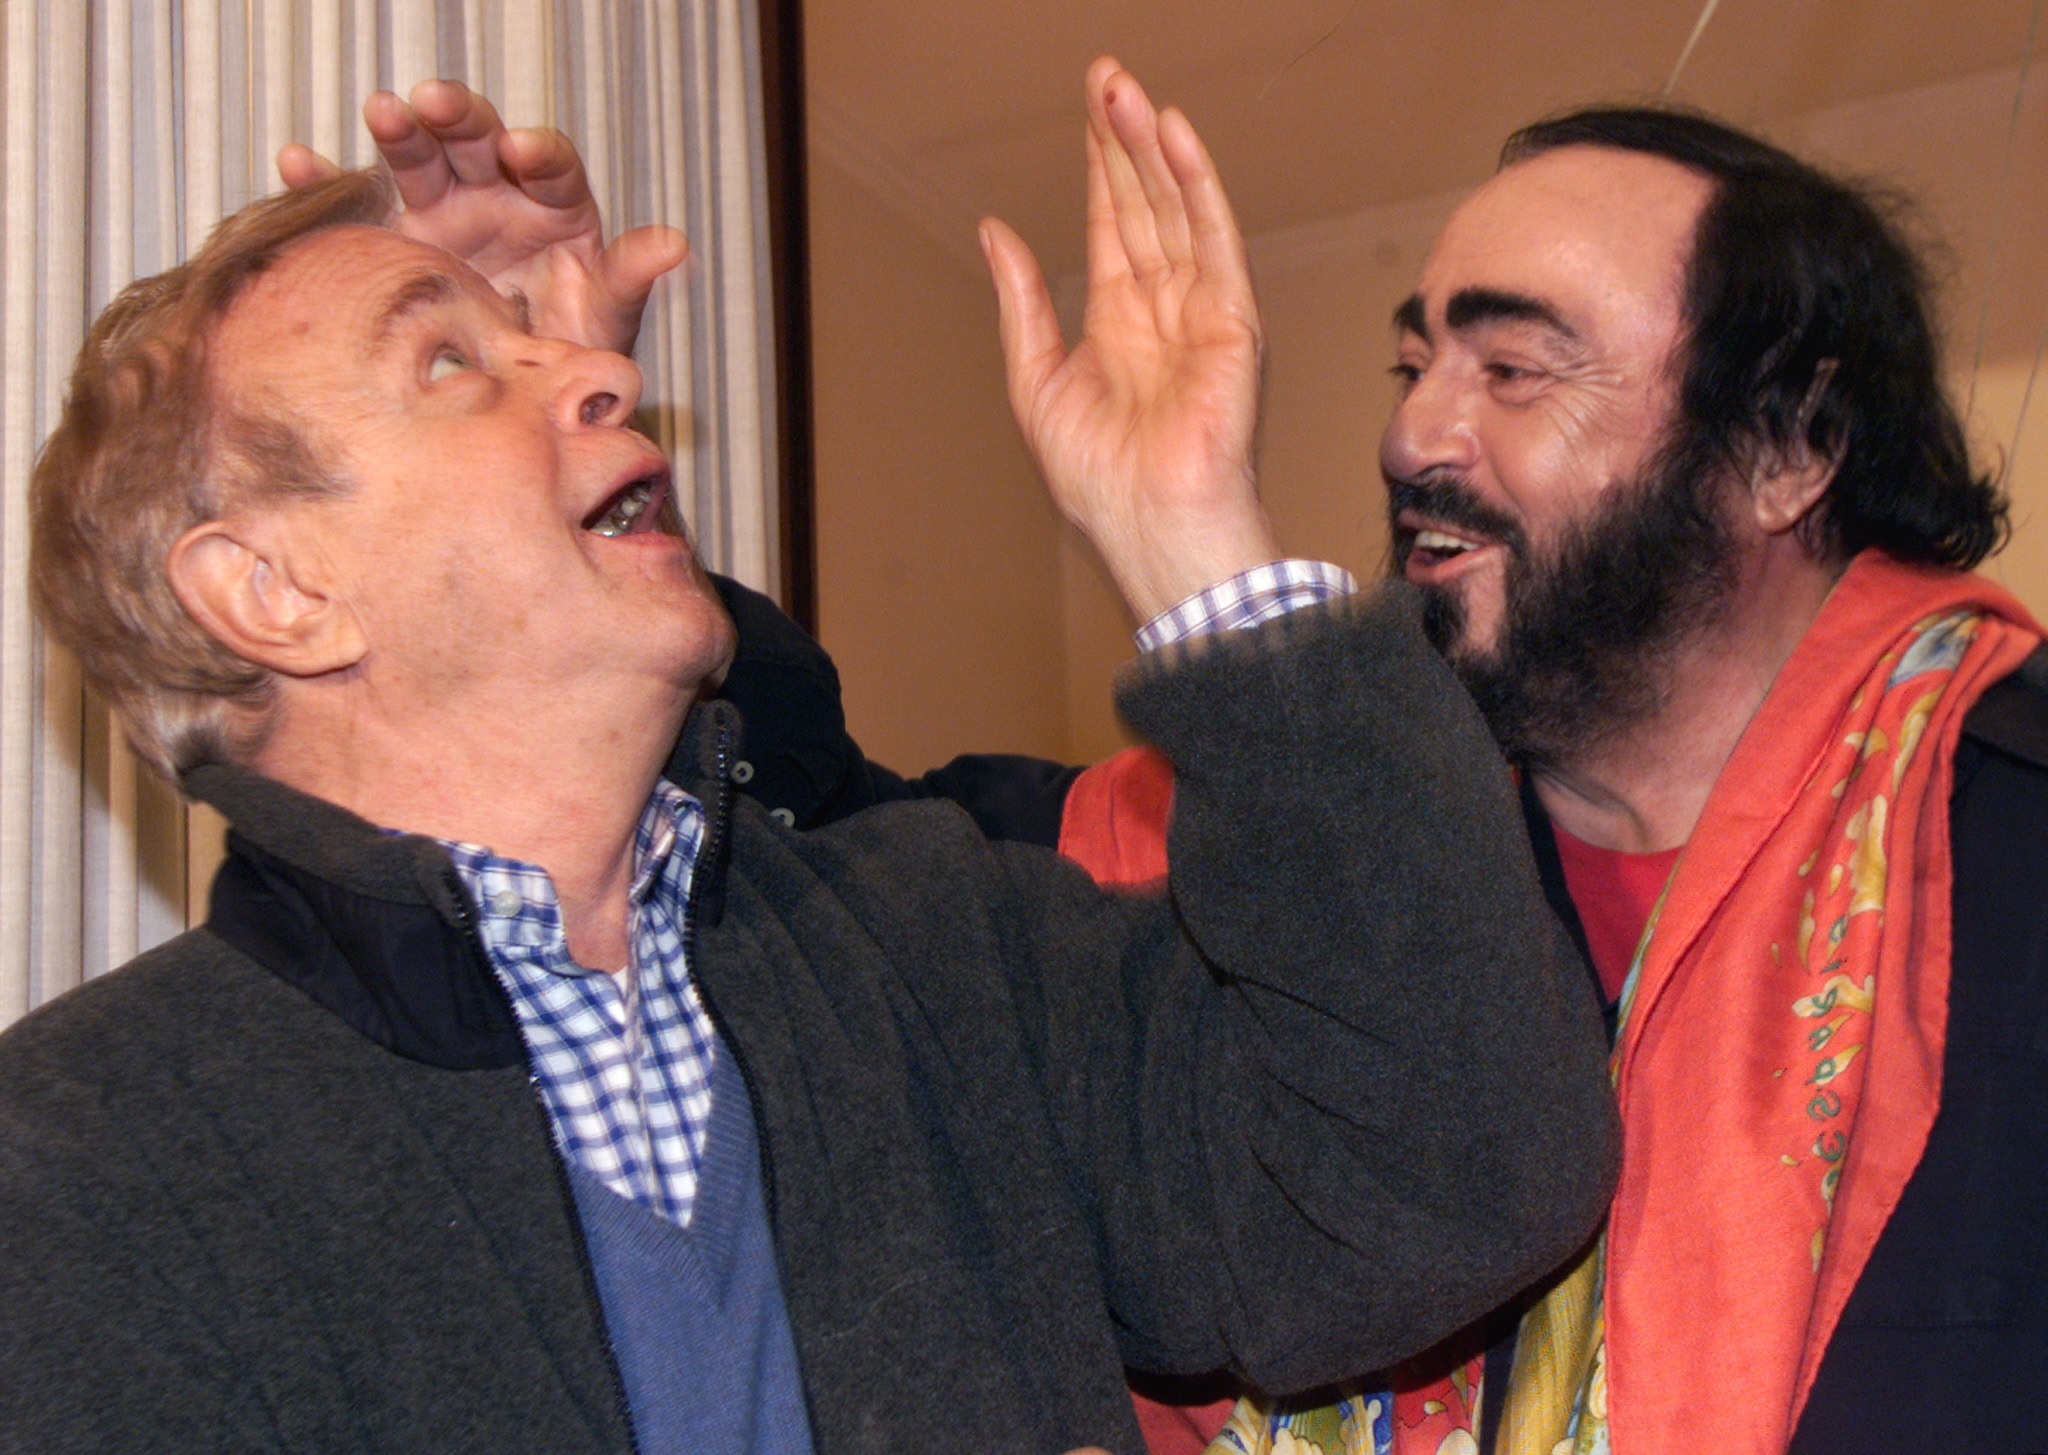 El director junto al tenor italiano Luciano Pavarotti.